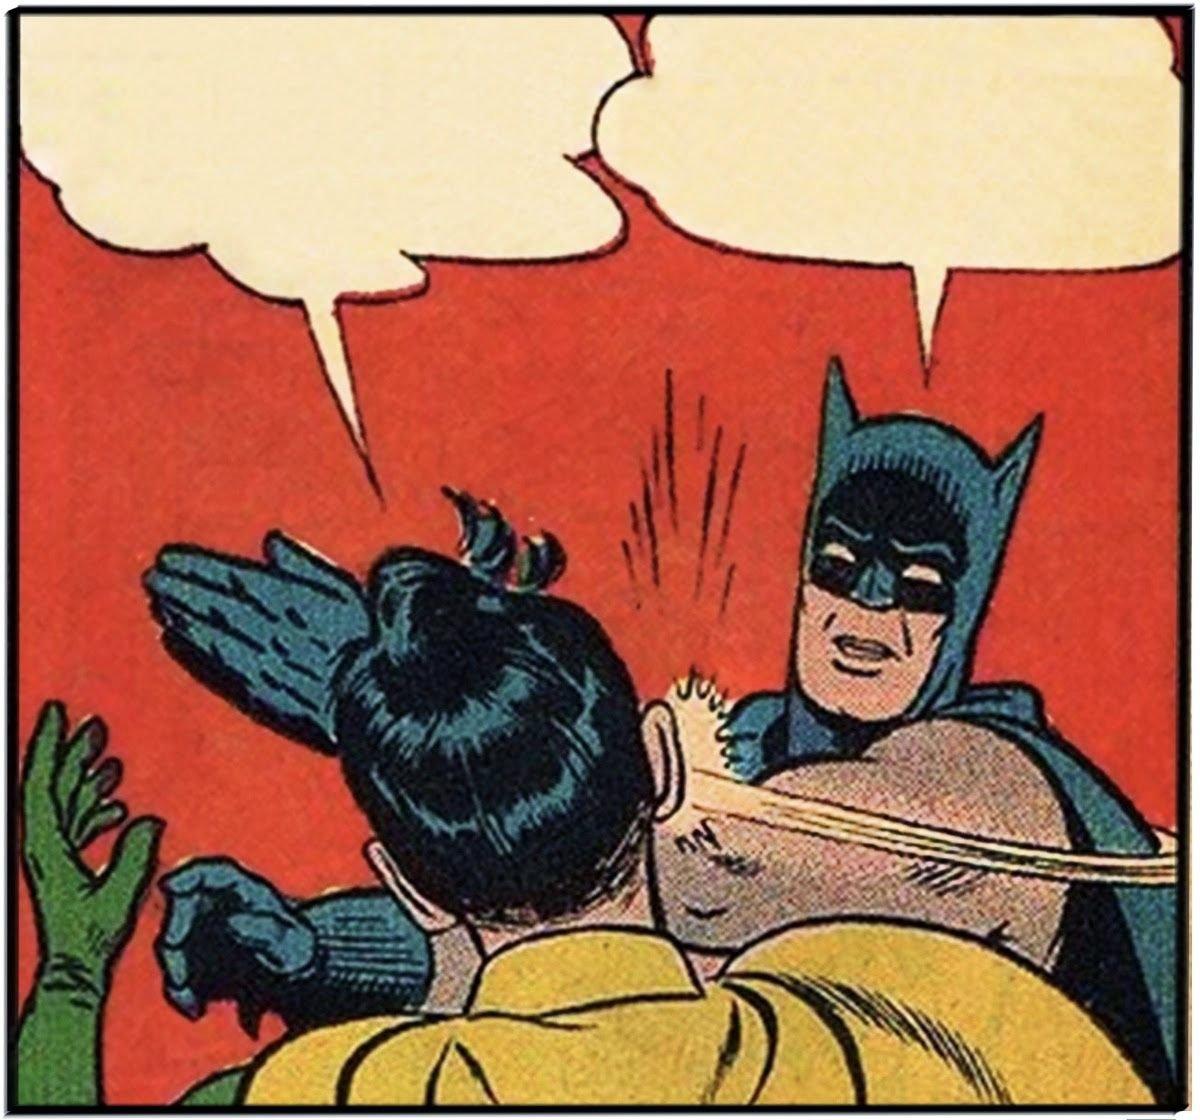 MemeHive Contest: Meme Batman Slapping Robin (1st Prize 5 HIVE)